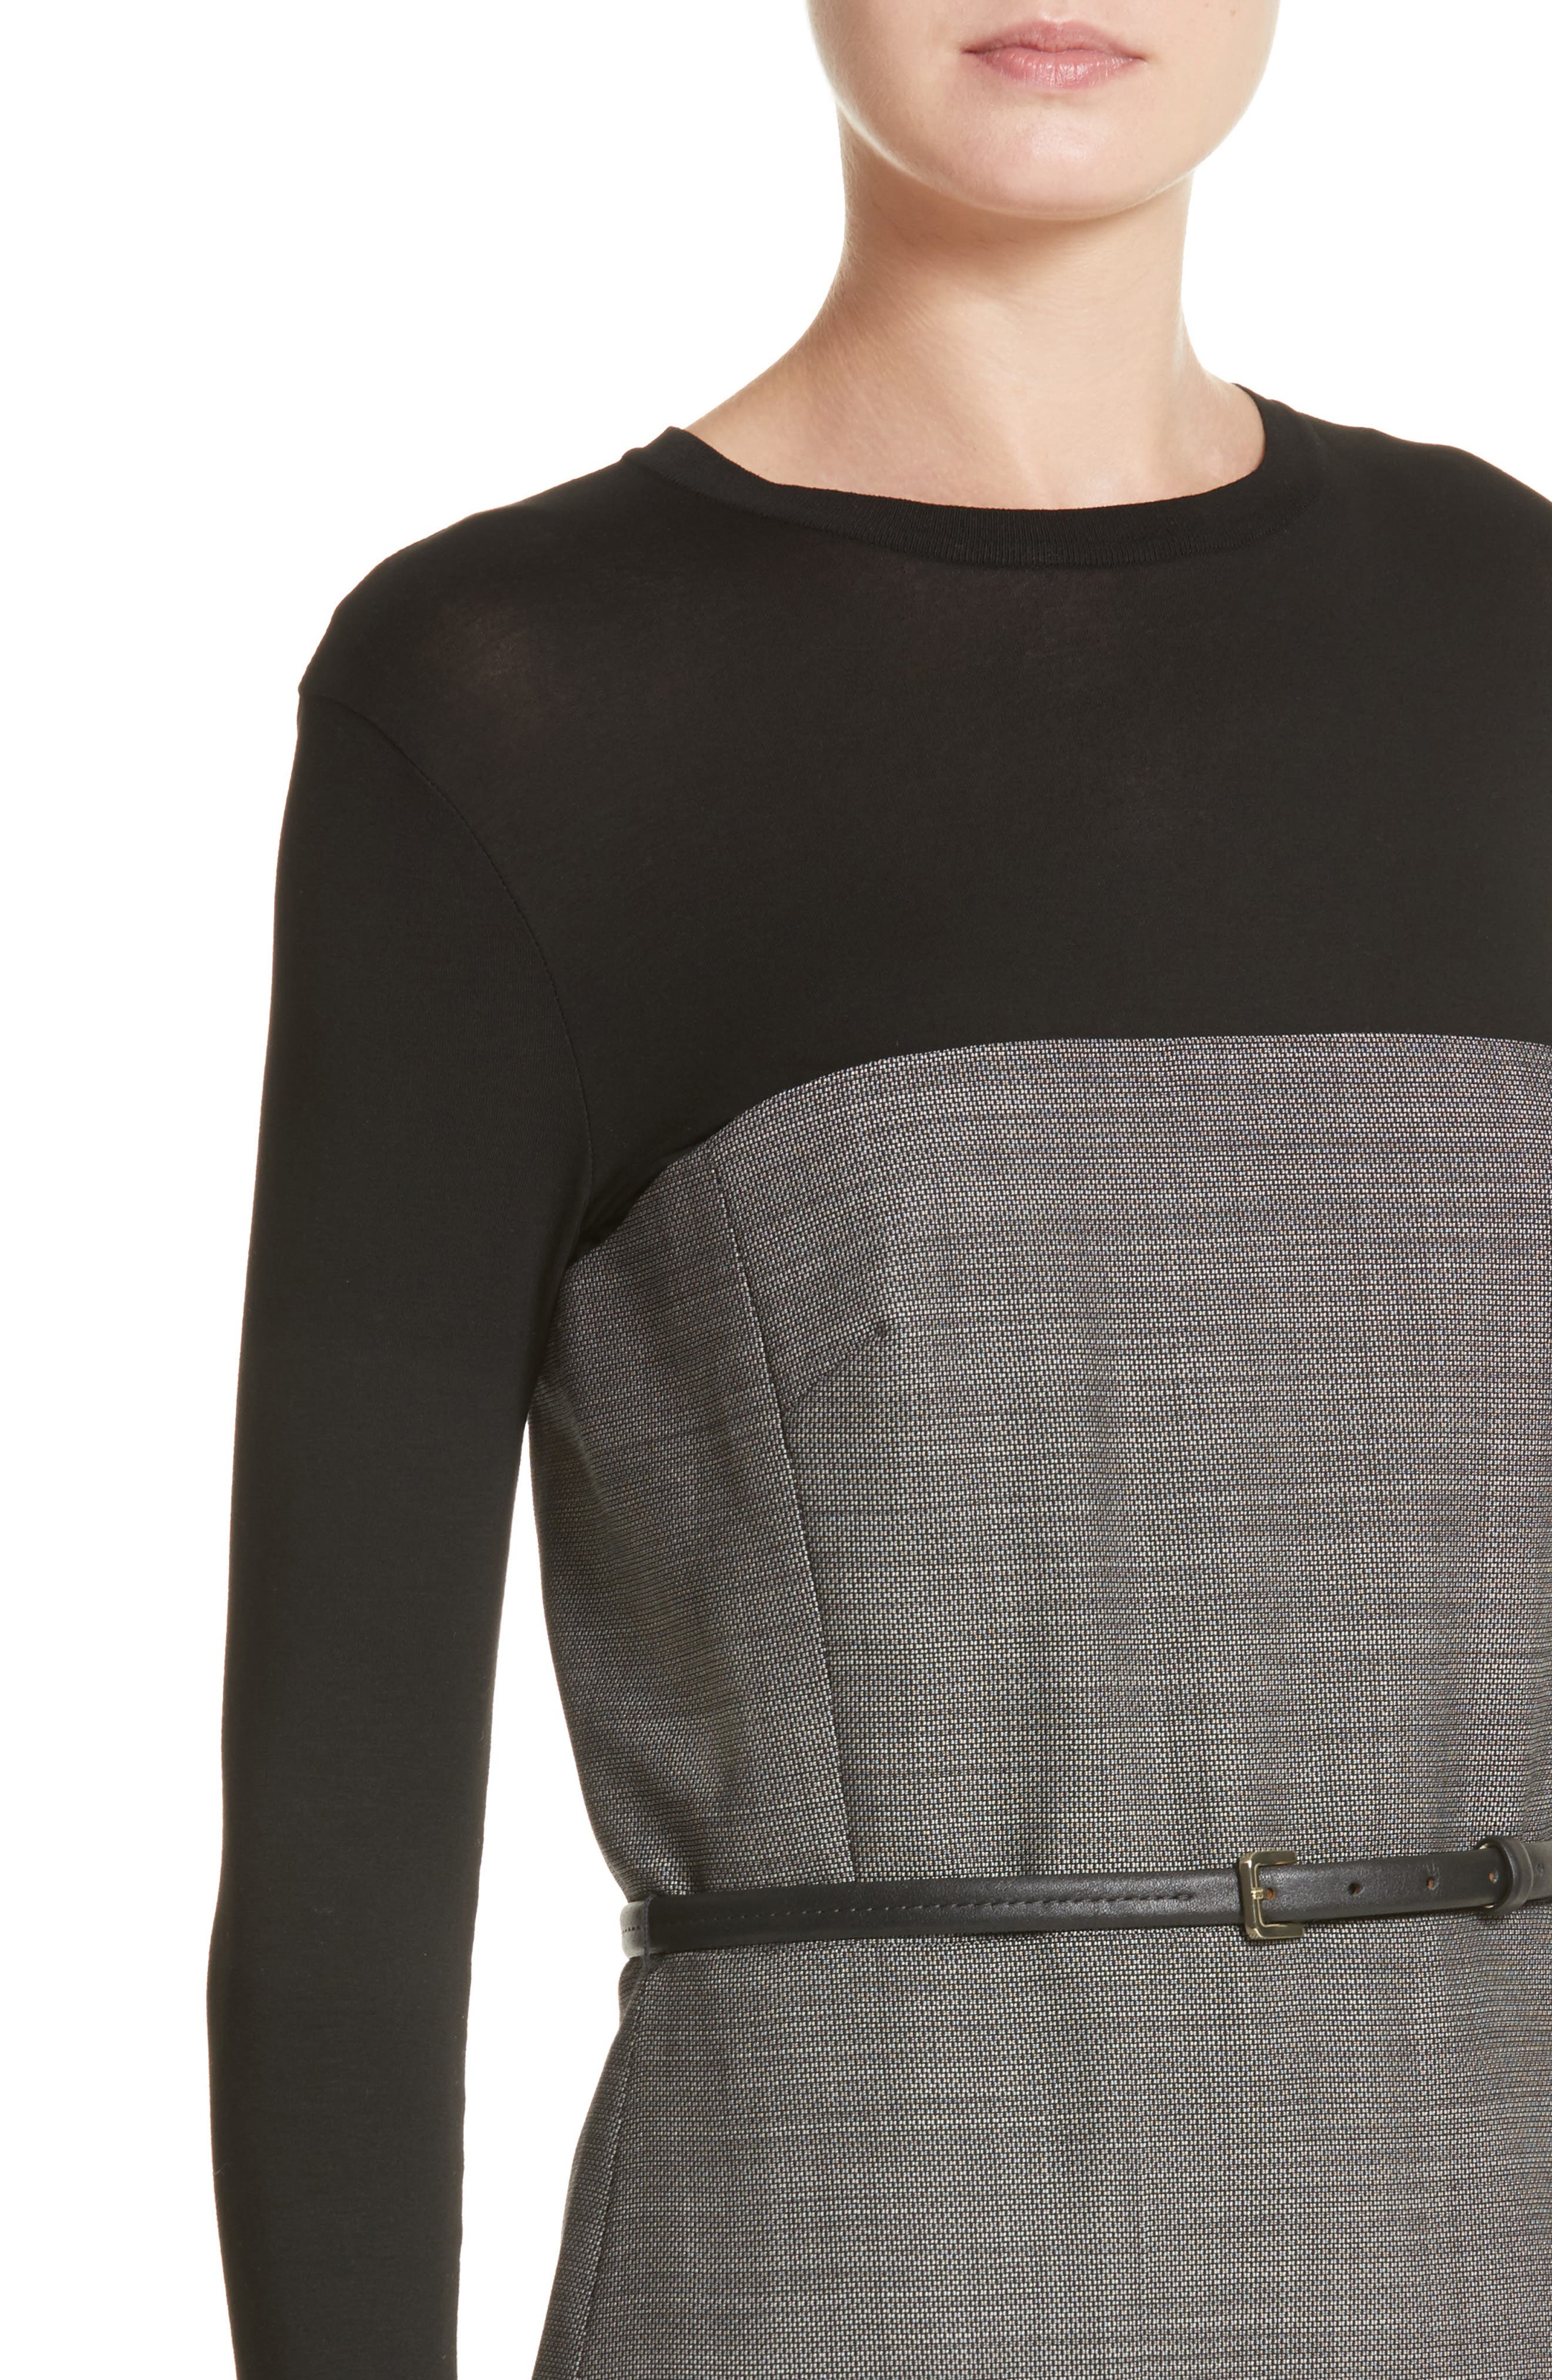 Canapa Stretch Wool Layered Sheath Dress,                             Alternate thumbnail 4, color,                             Black